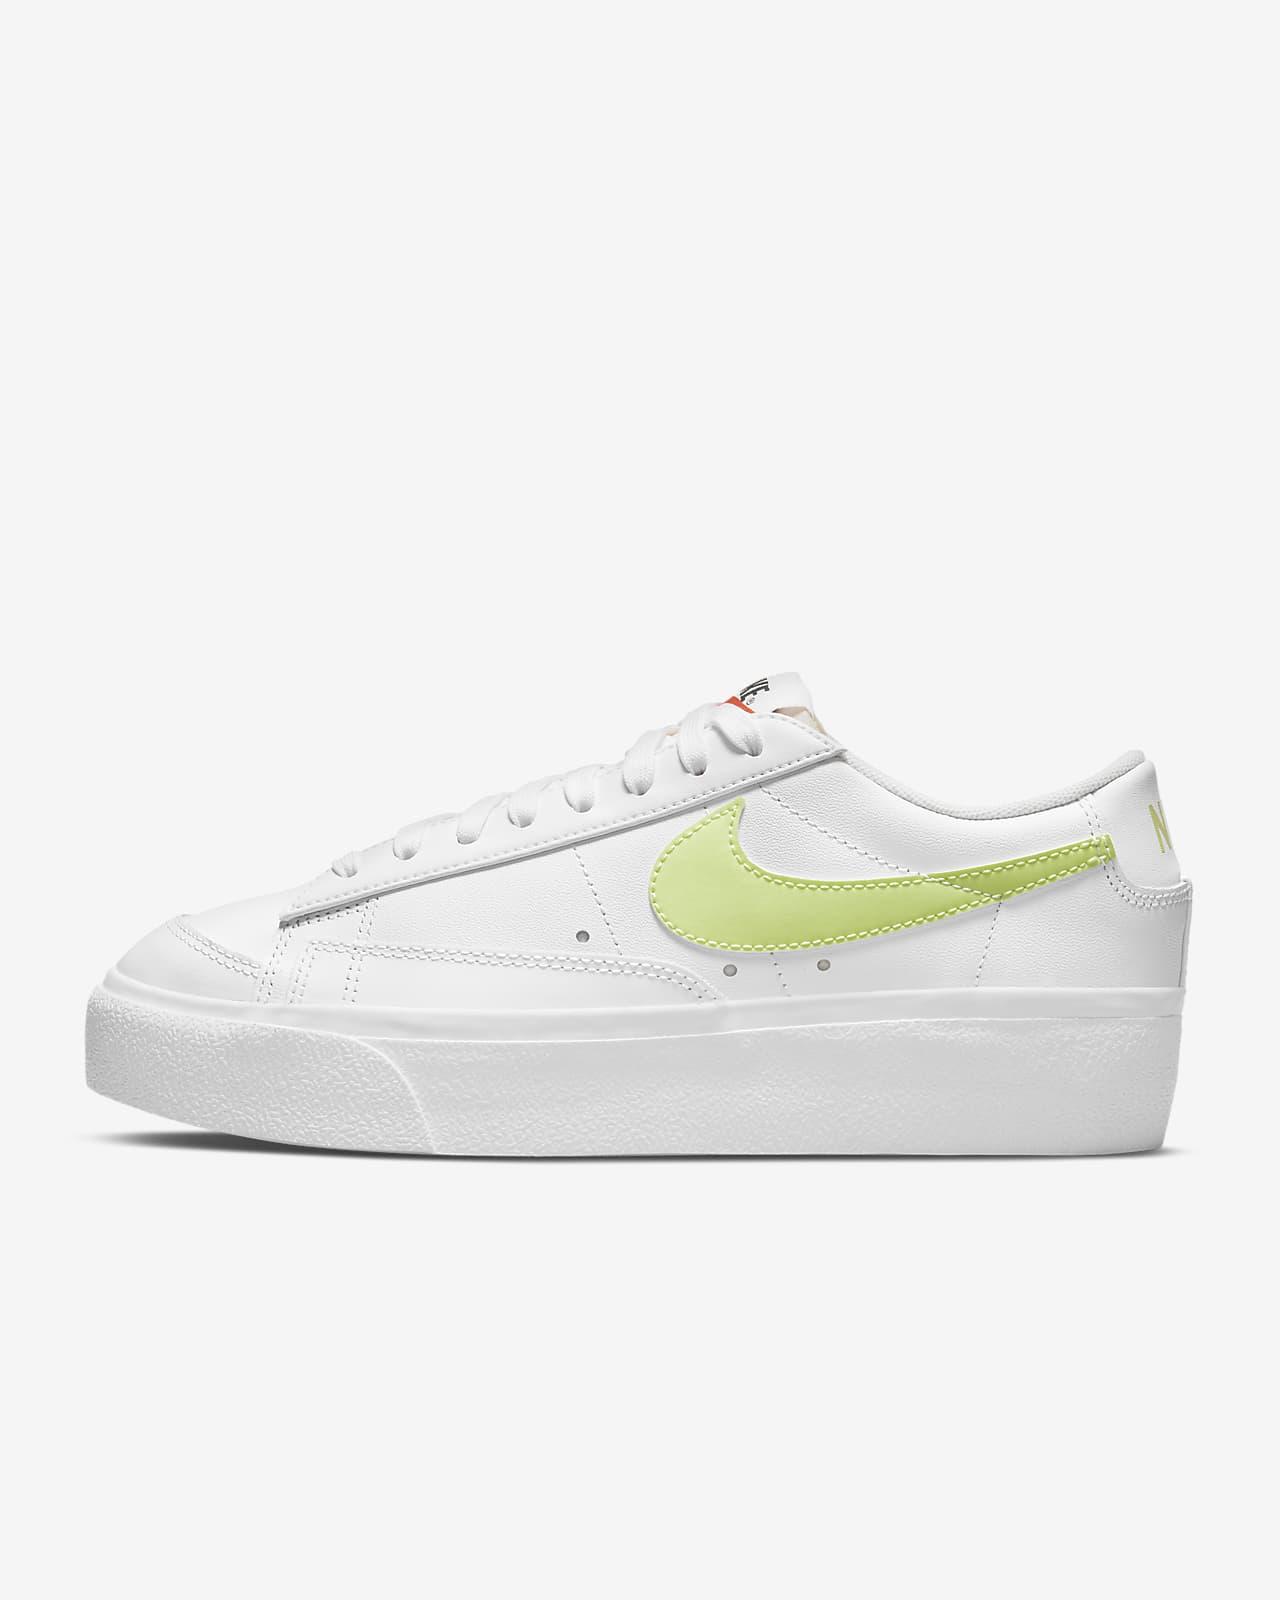 Nike Blazer Low Platform Damenschuh